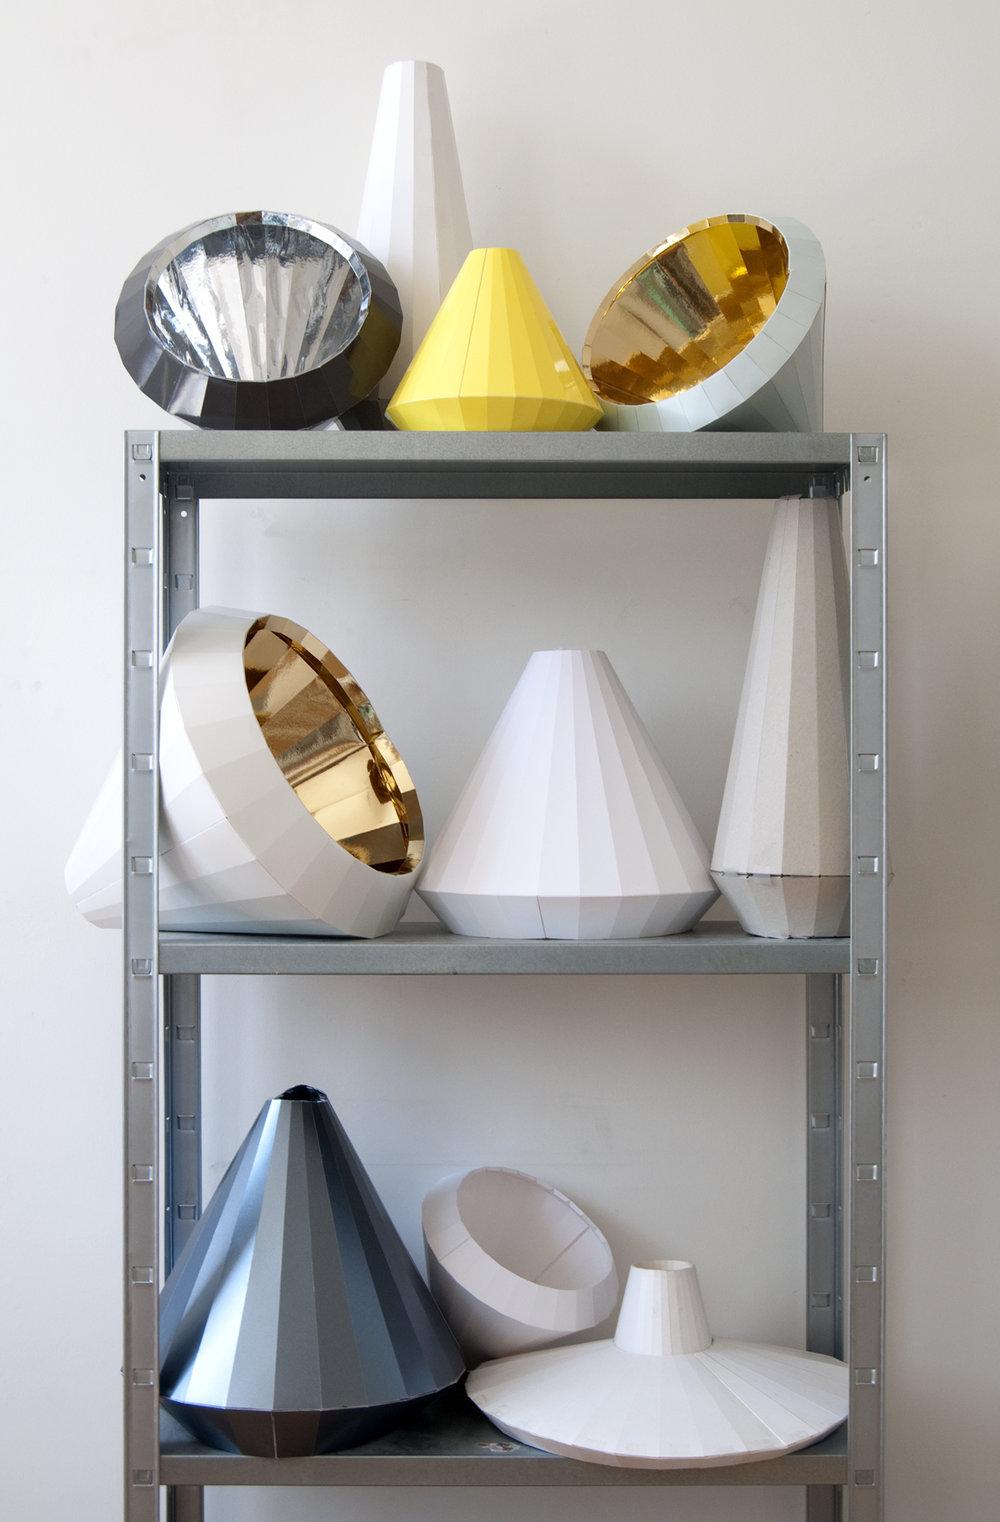 lampen modellen.jpg